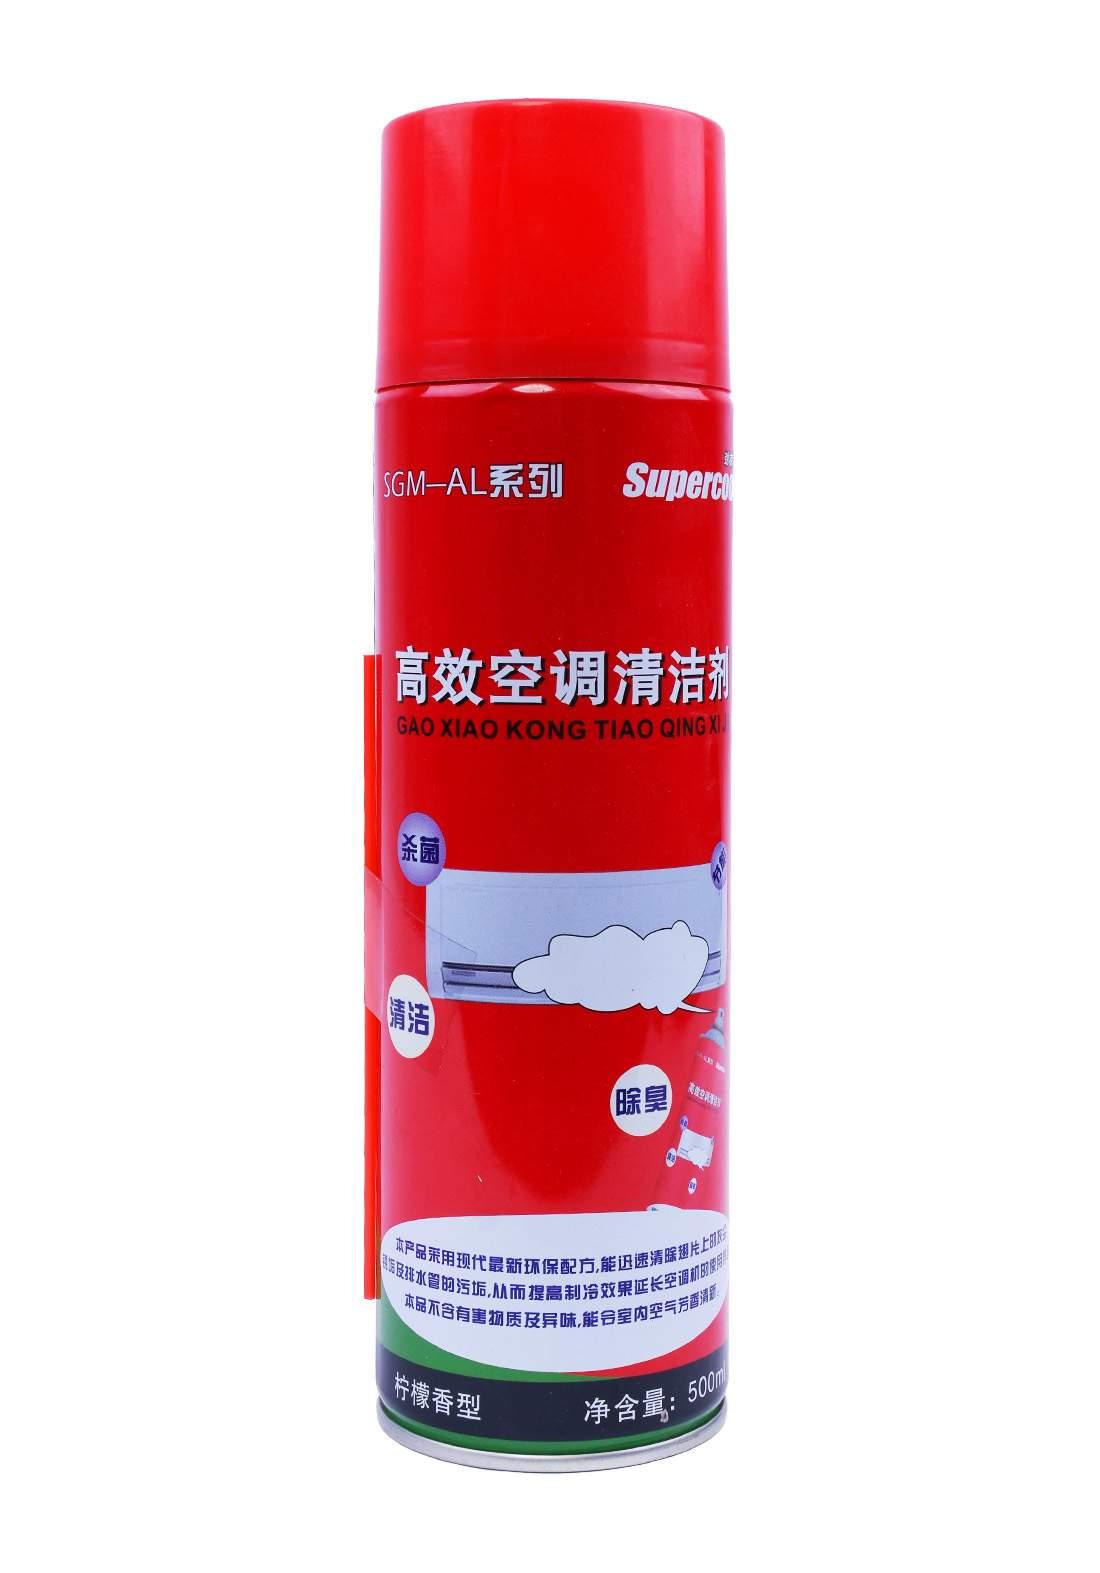 Supercool l Air Conditioner Cleaner 500 ml بخاخ منظف التبريد